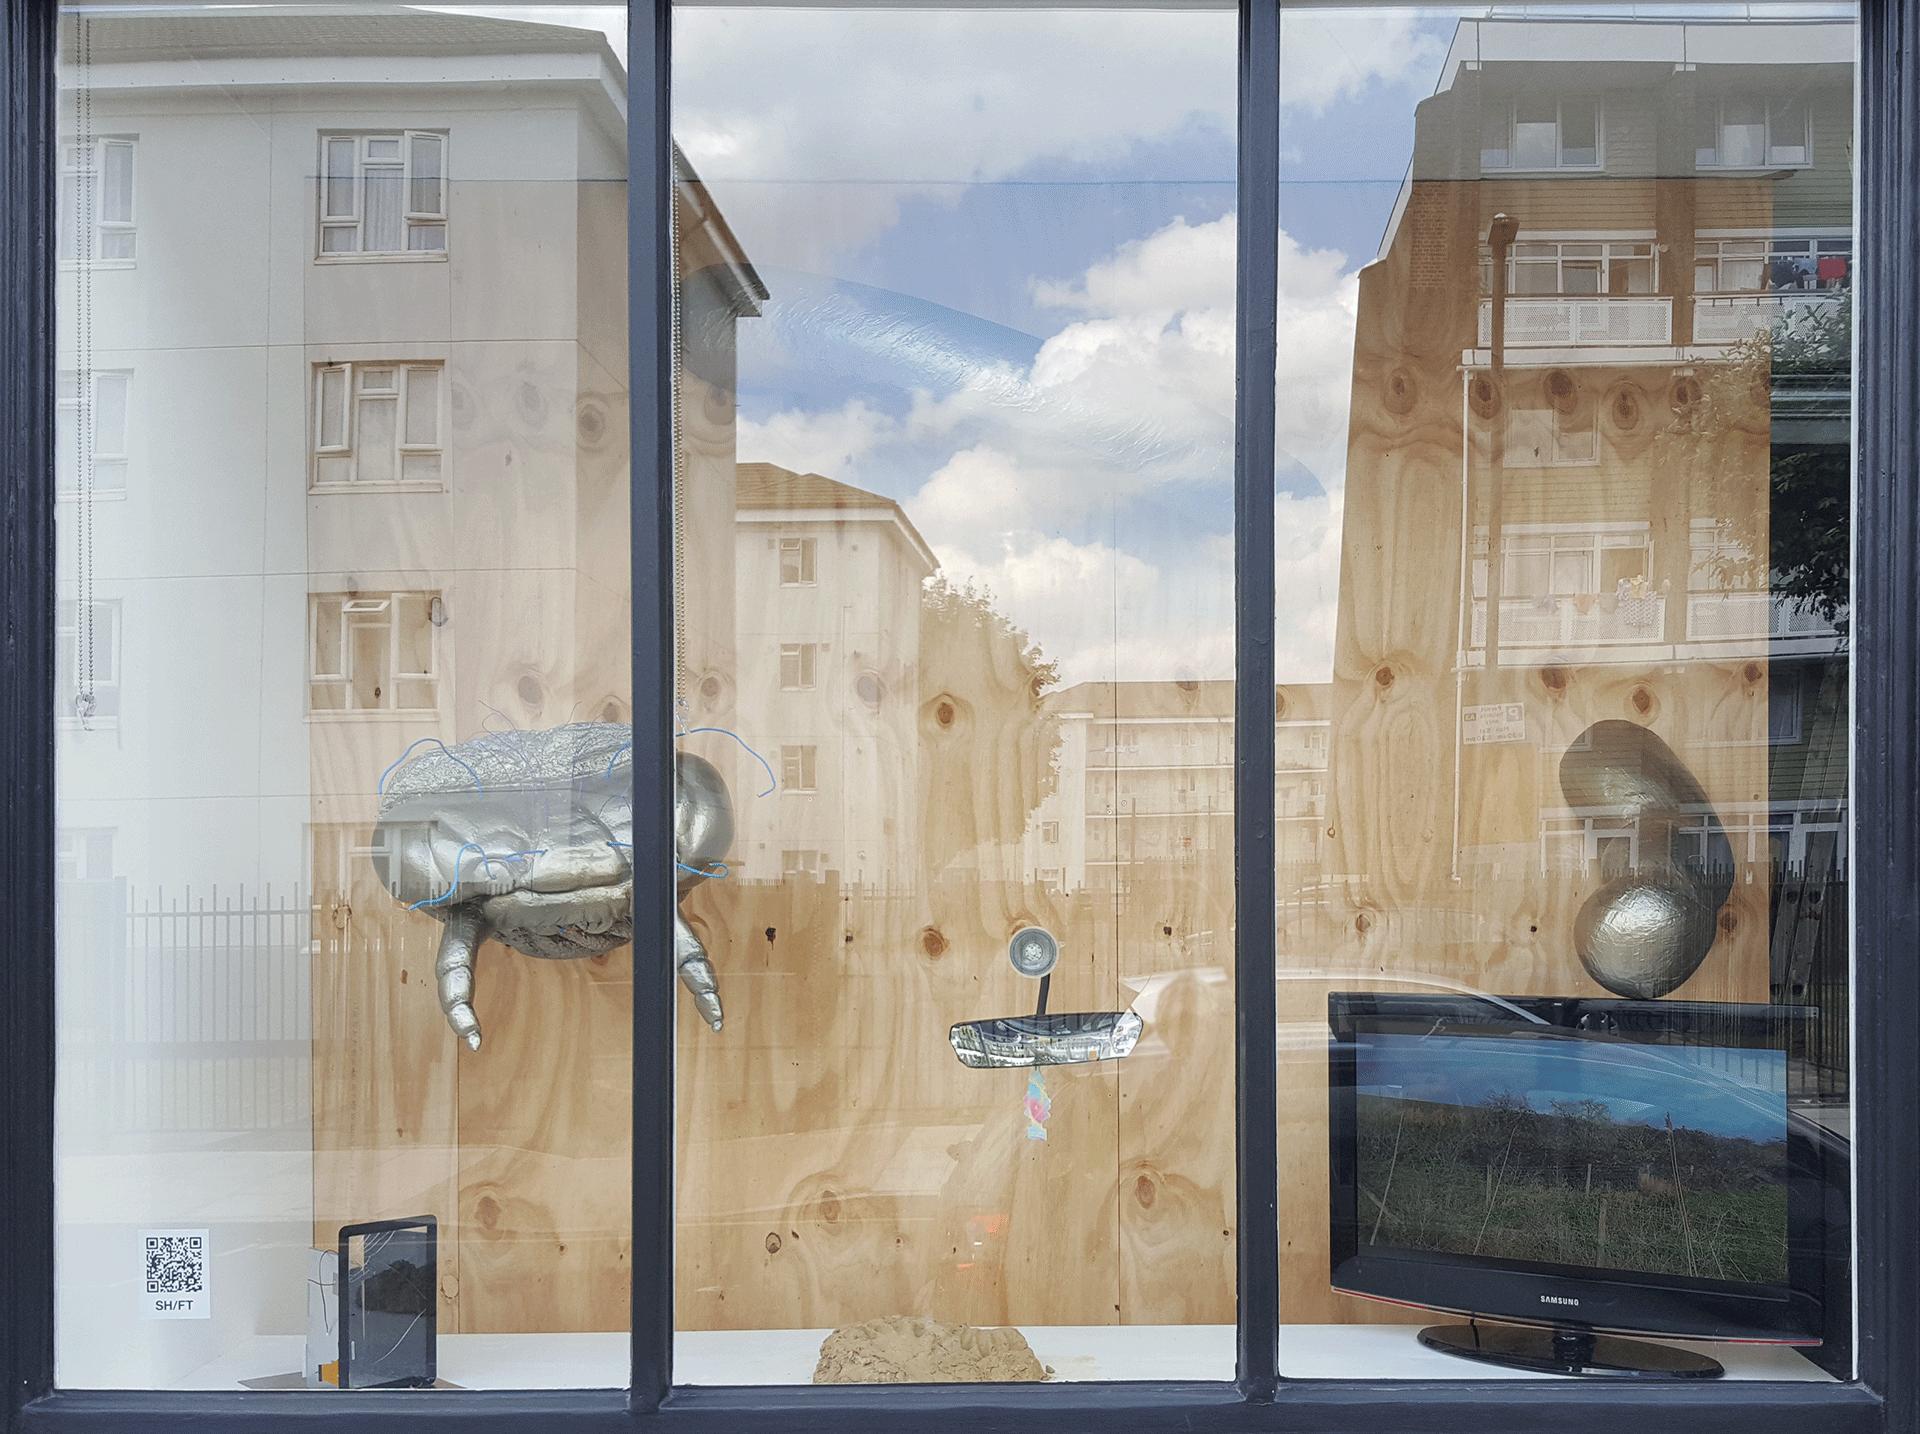 Veronika Neukirch, Davinia-Ann Robinson, Elisabeth Molin, Serra Tansel, SH/FT installation view, 2021